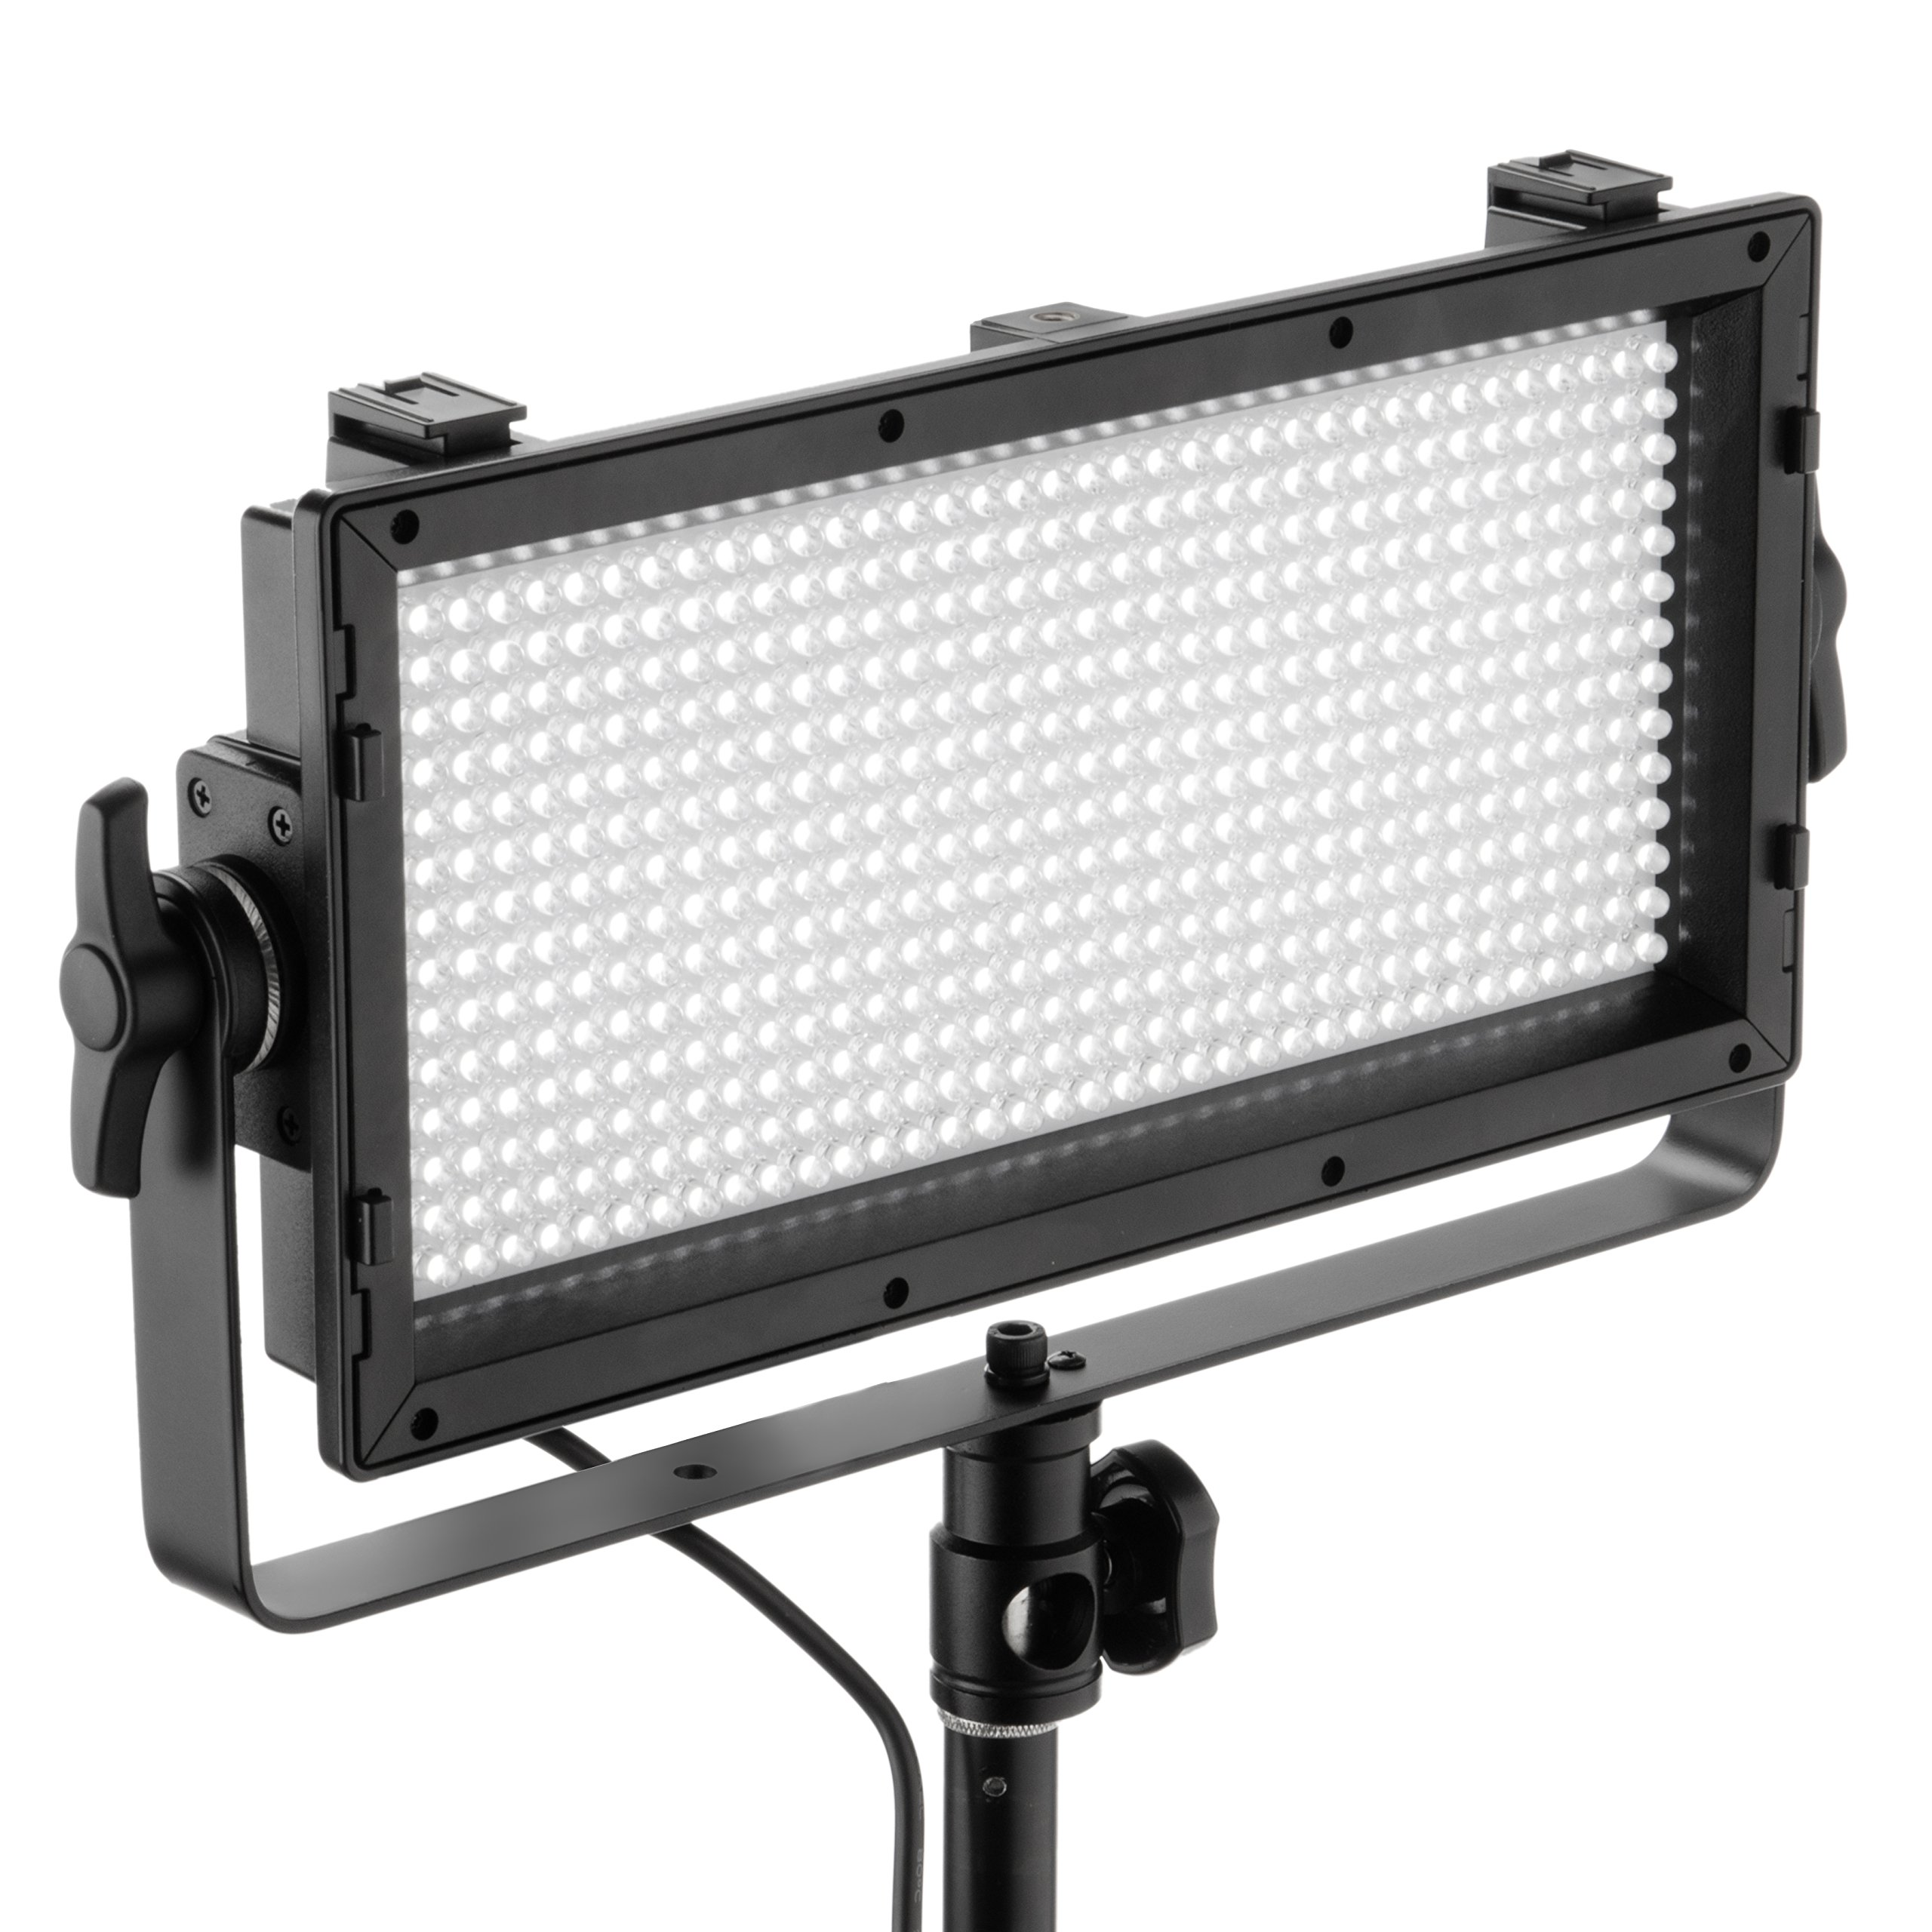 Genaray SpectroLED Essential 500 Daylight LED Light